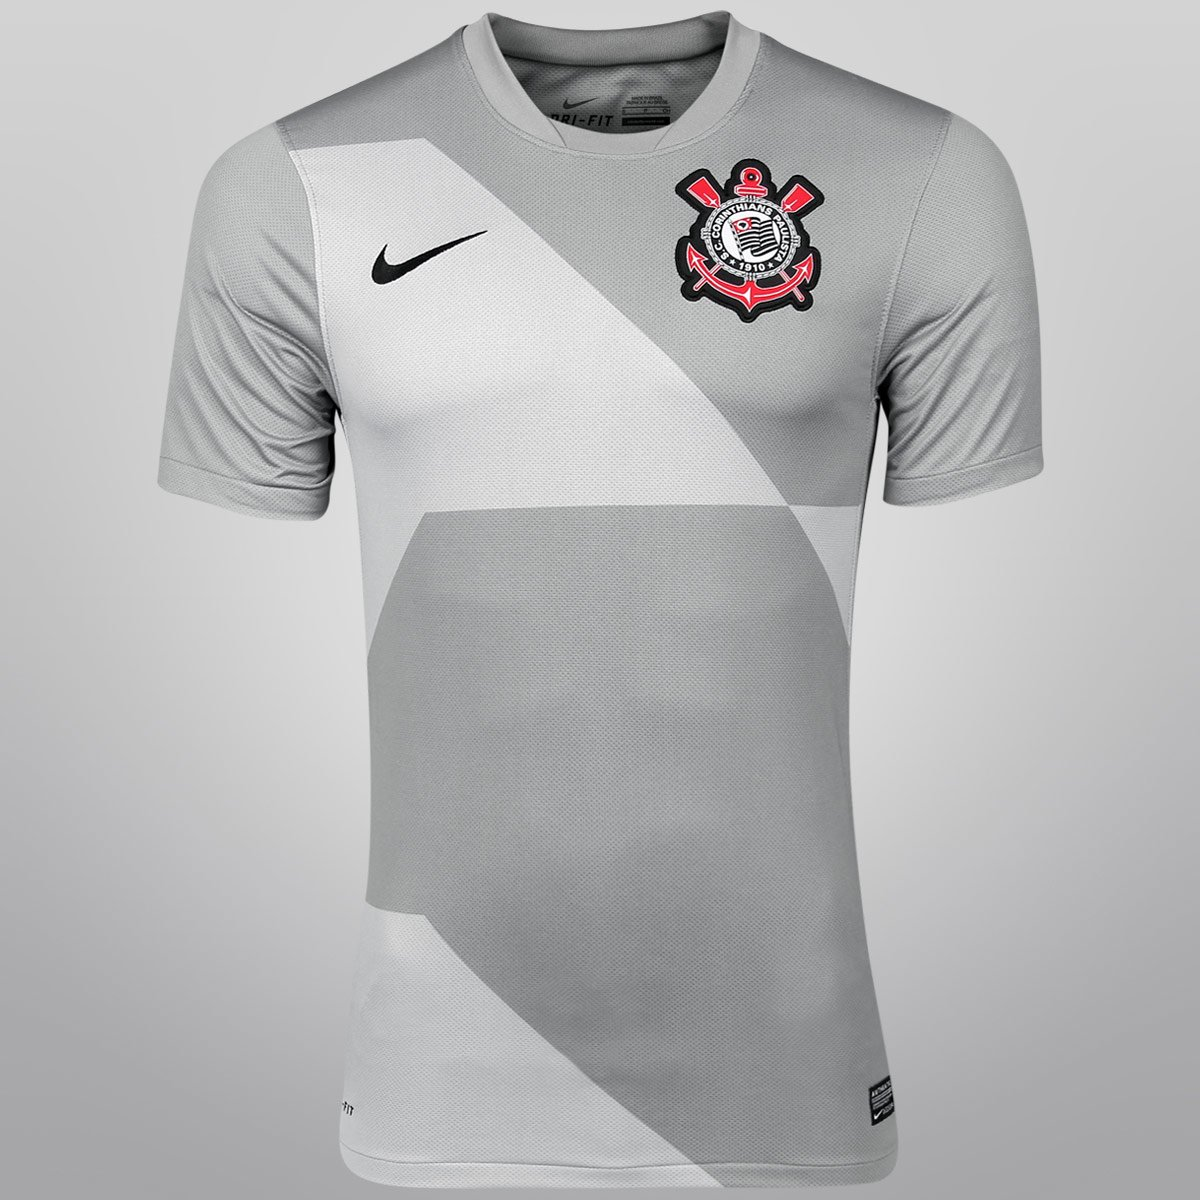 df946cf4b8 Camisa Nike Corinthians III 12 13 s nº - Compre Agora